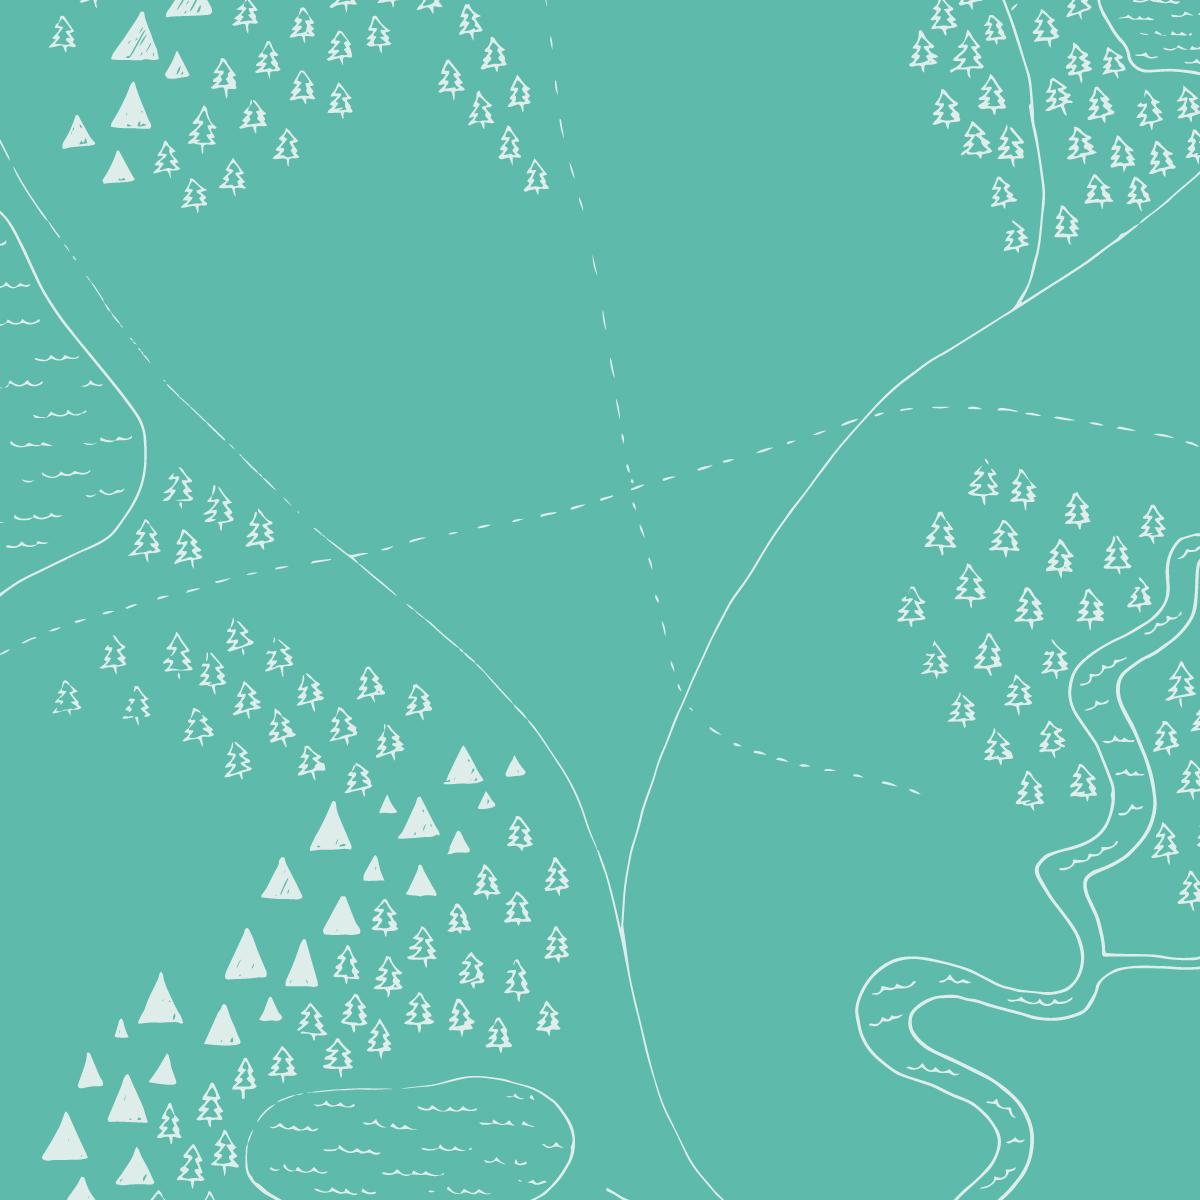 Map Patterns-05.jpg